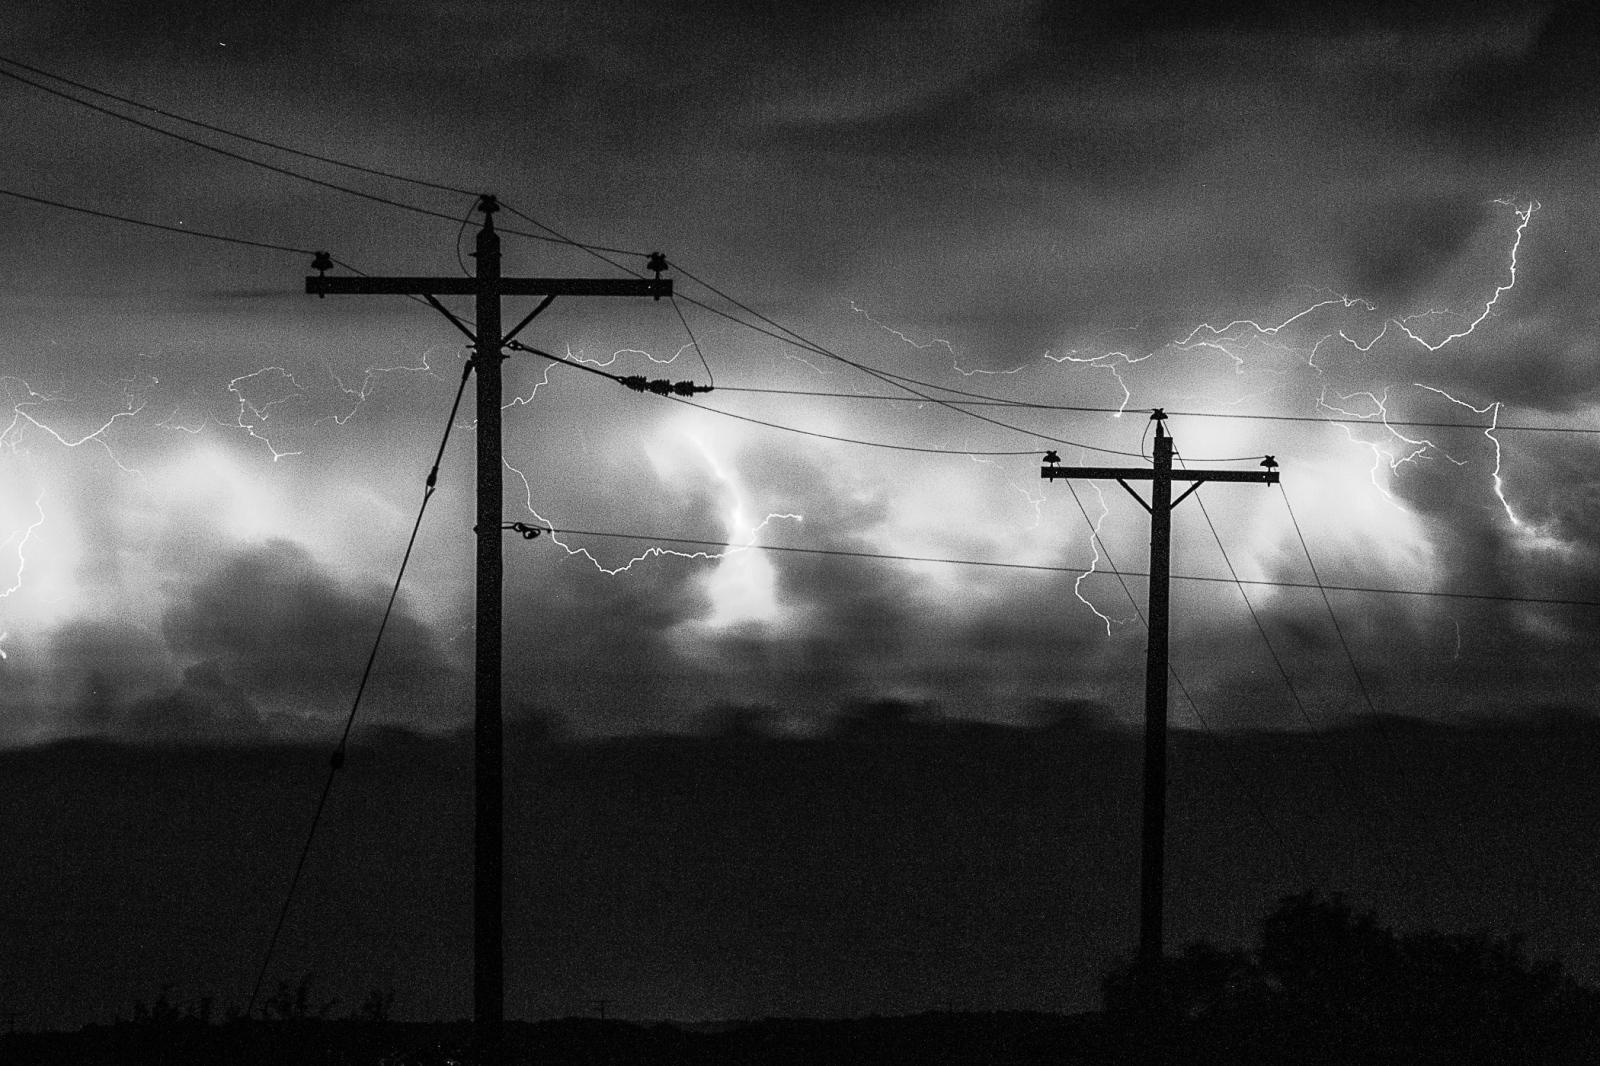 Art and Documentary Photography - Loading SebastianZuletaRios_LenteTrinchera_8Y6A375001715_de_julio_de_2017.jpg